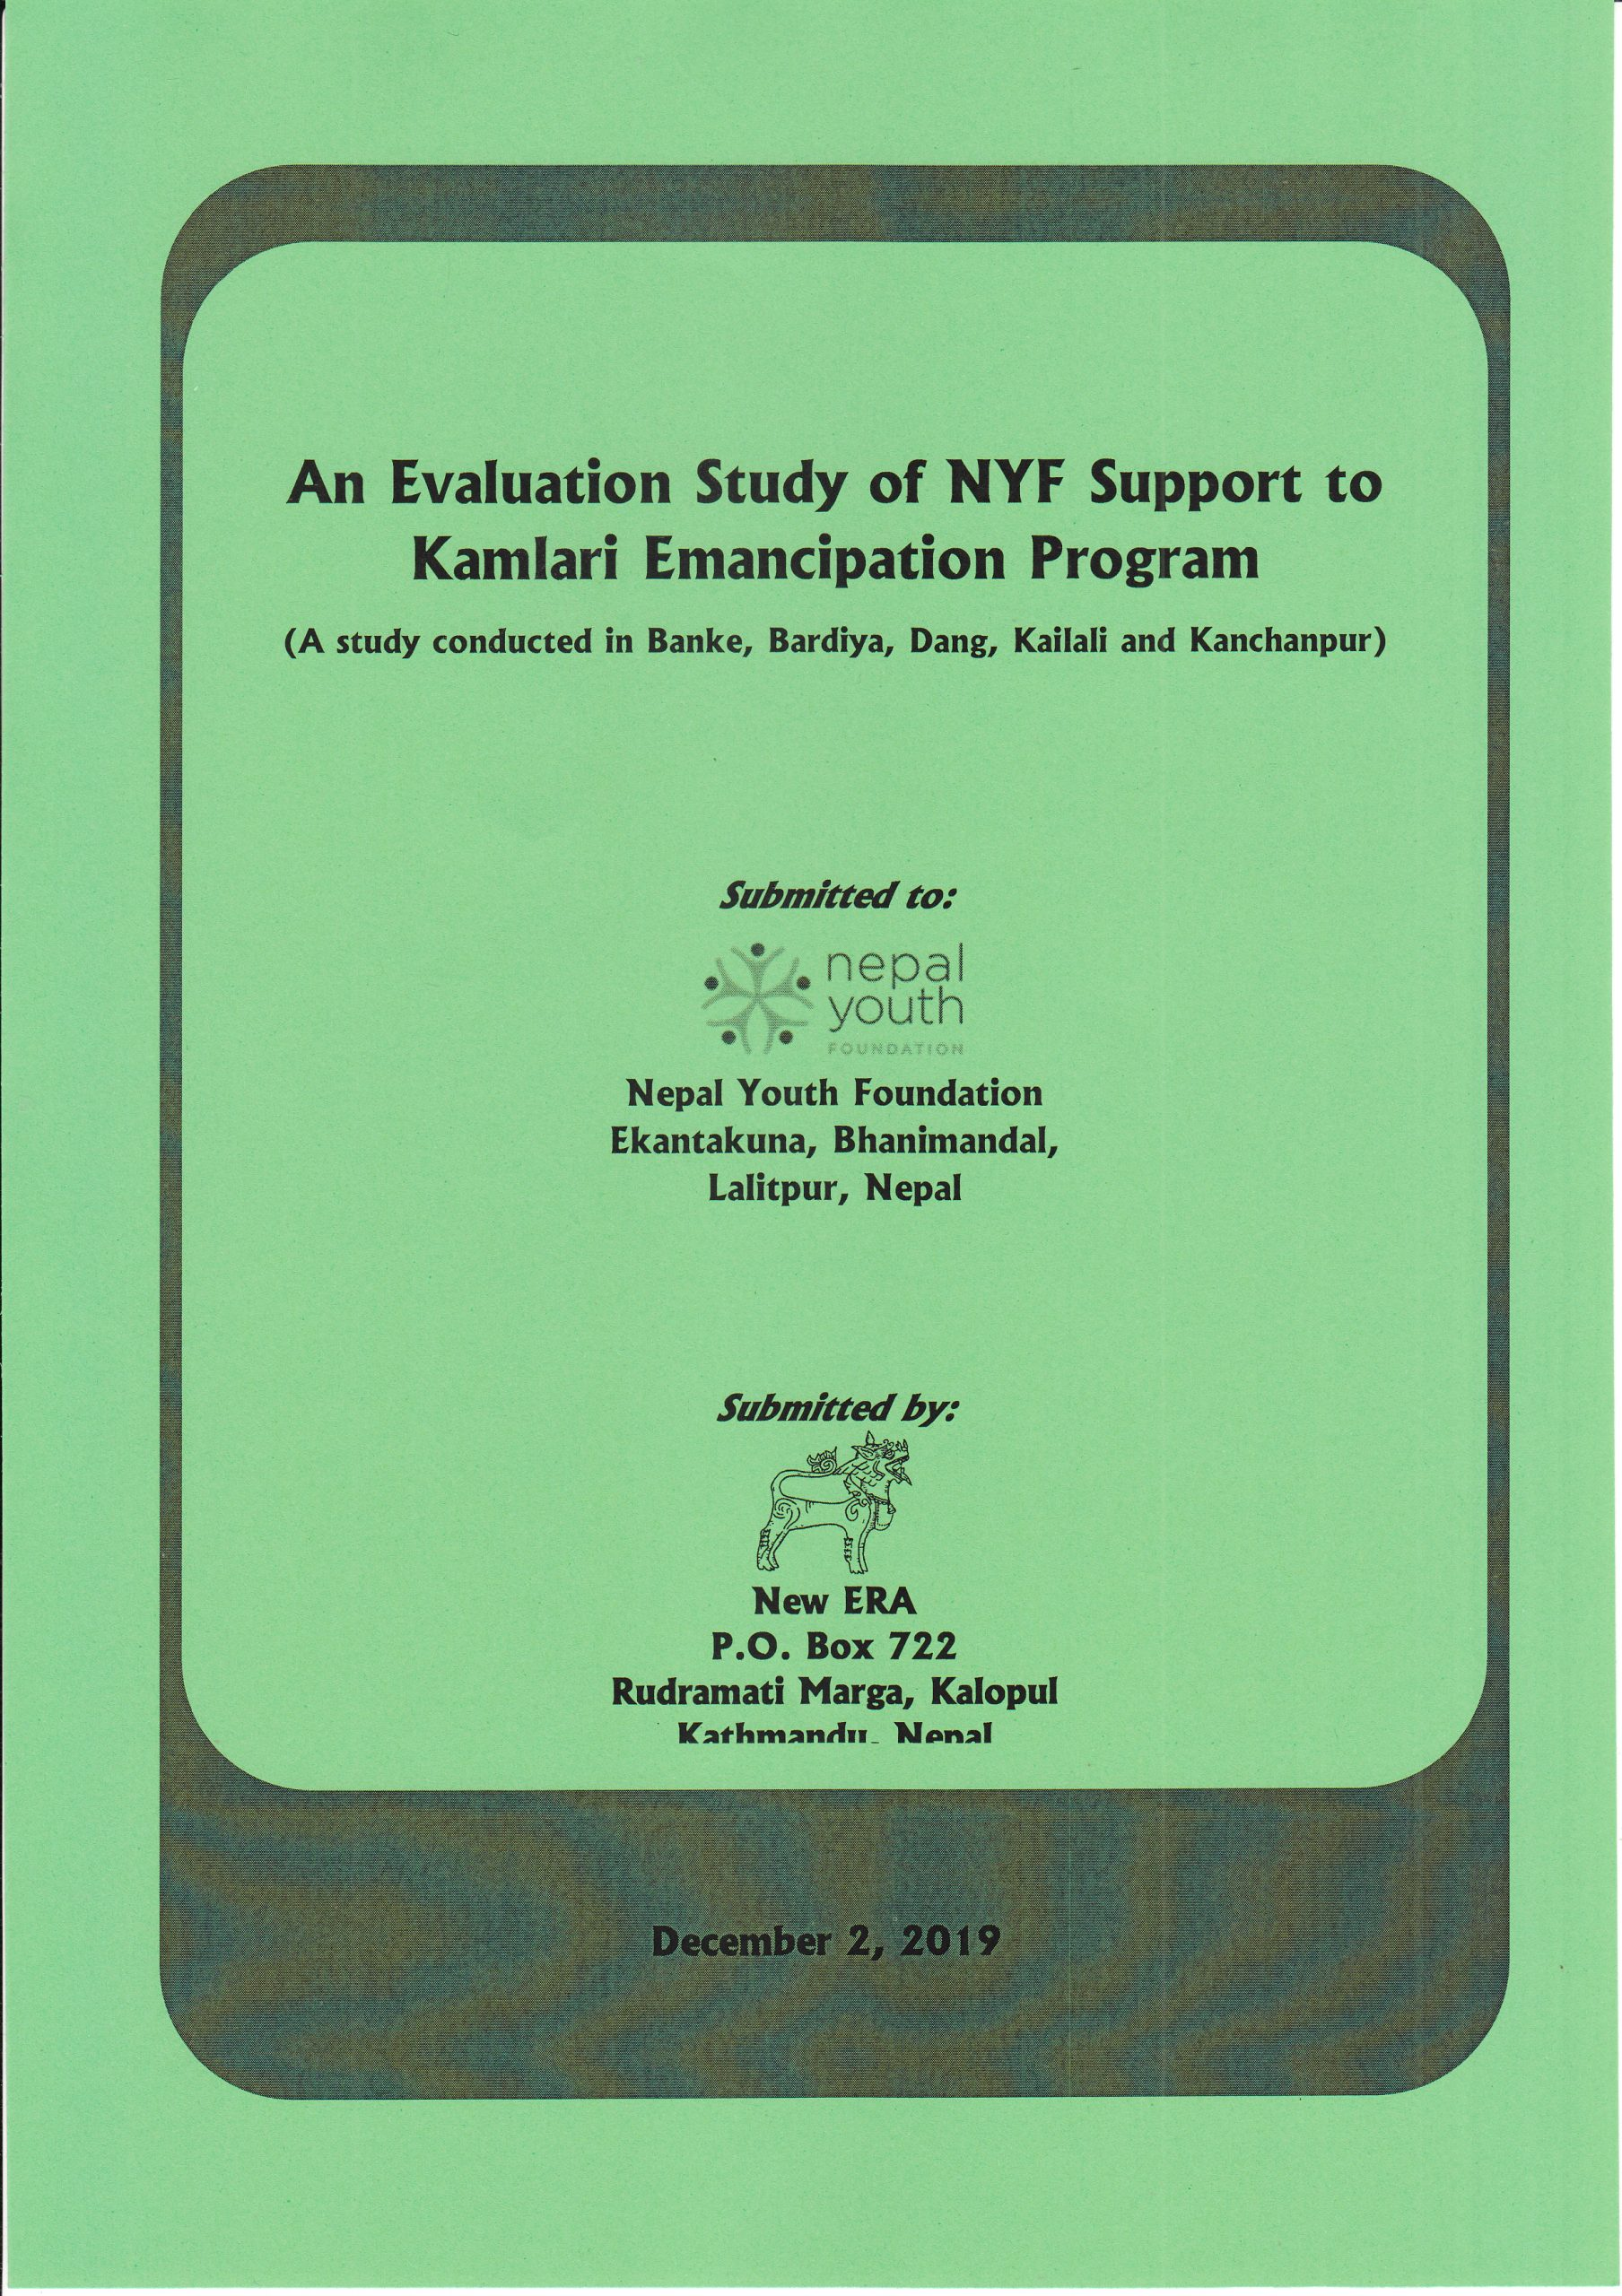 An Evaluation Study of NYF Support to Kamlari Emancipation Program